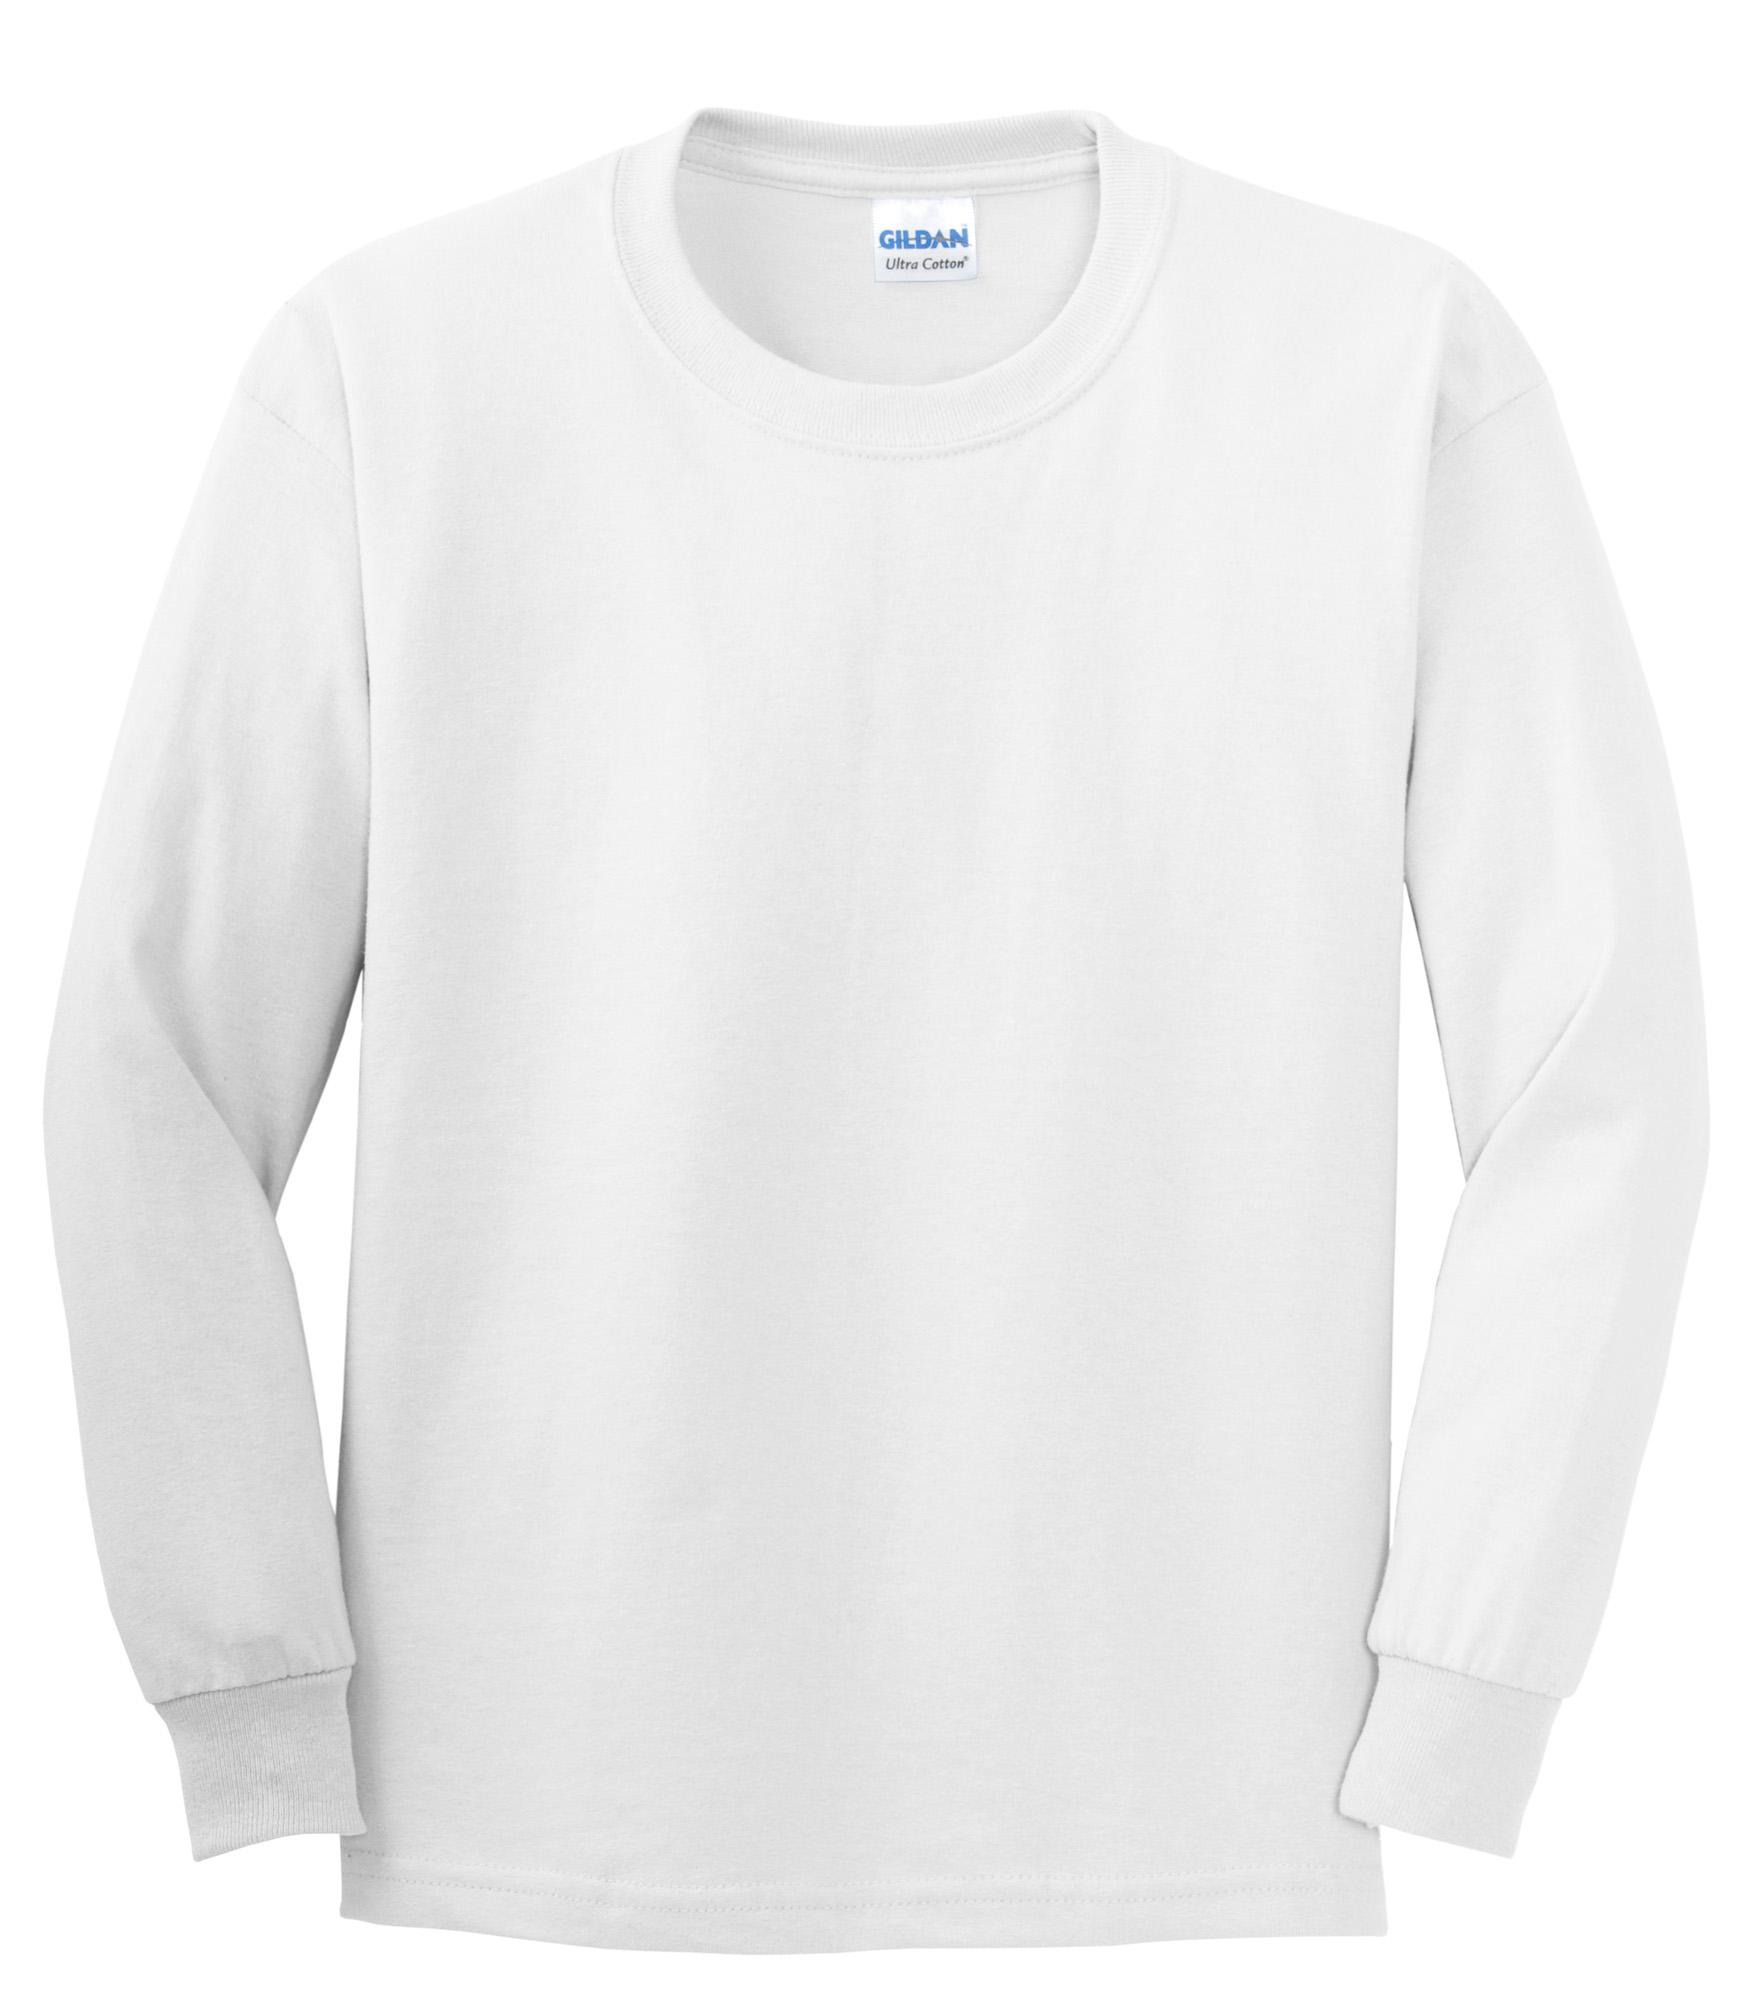 Gildan Youth Long Sleeve T-shirt Long Sleeve T-shirt 363ls